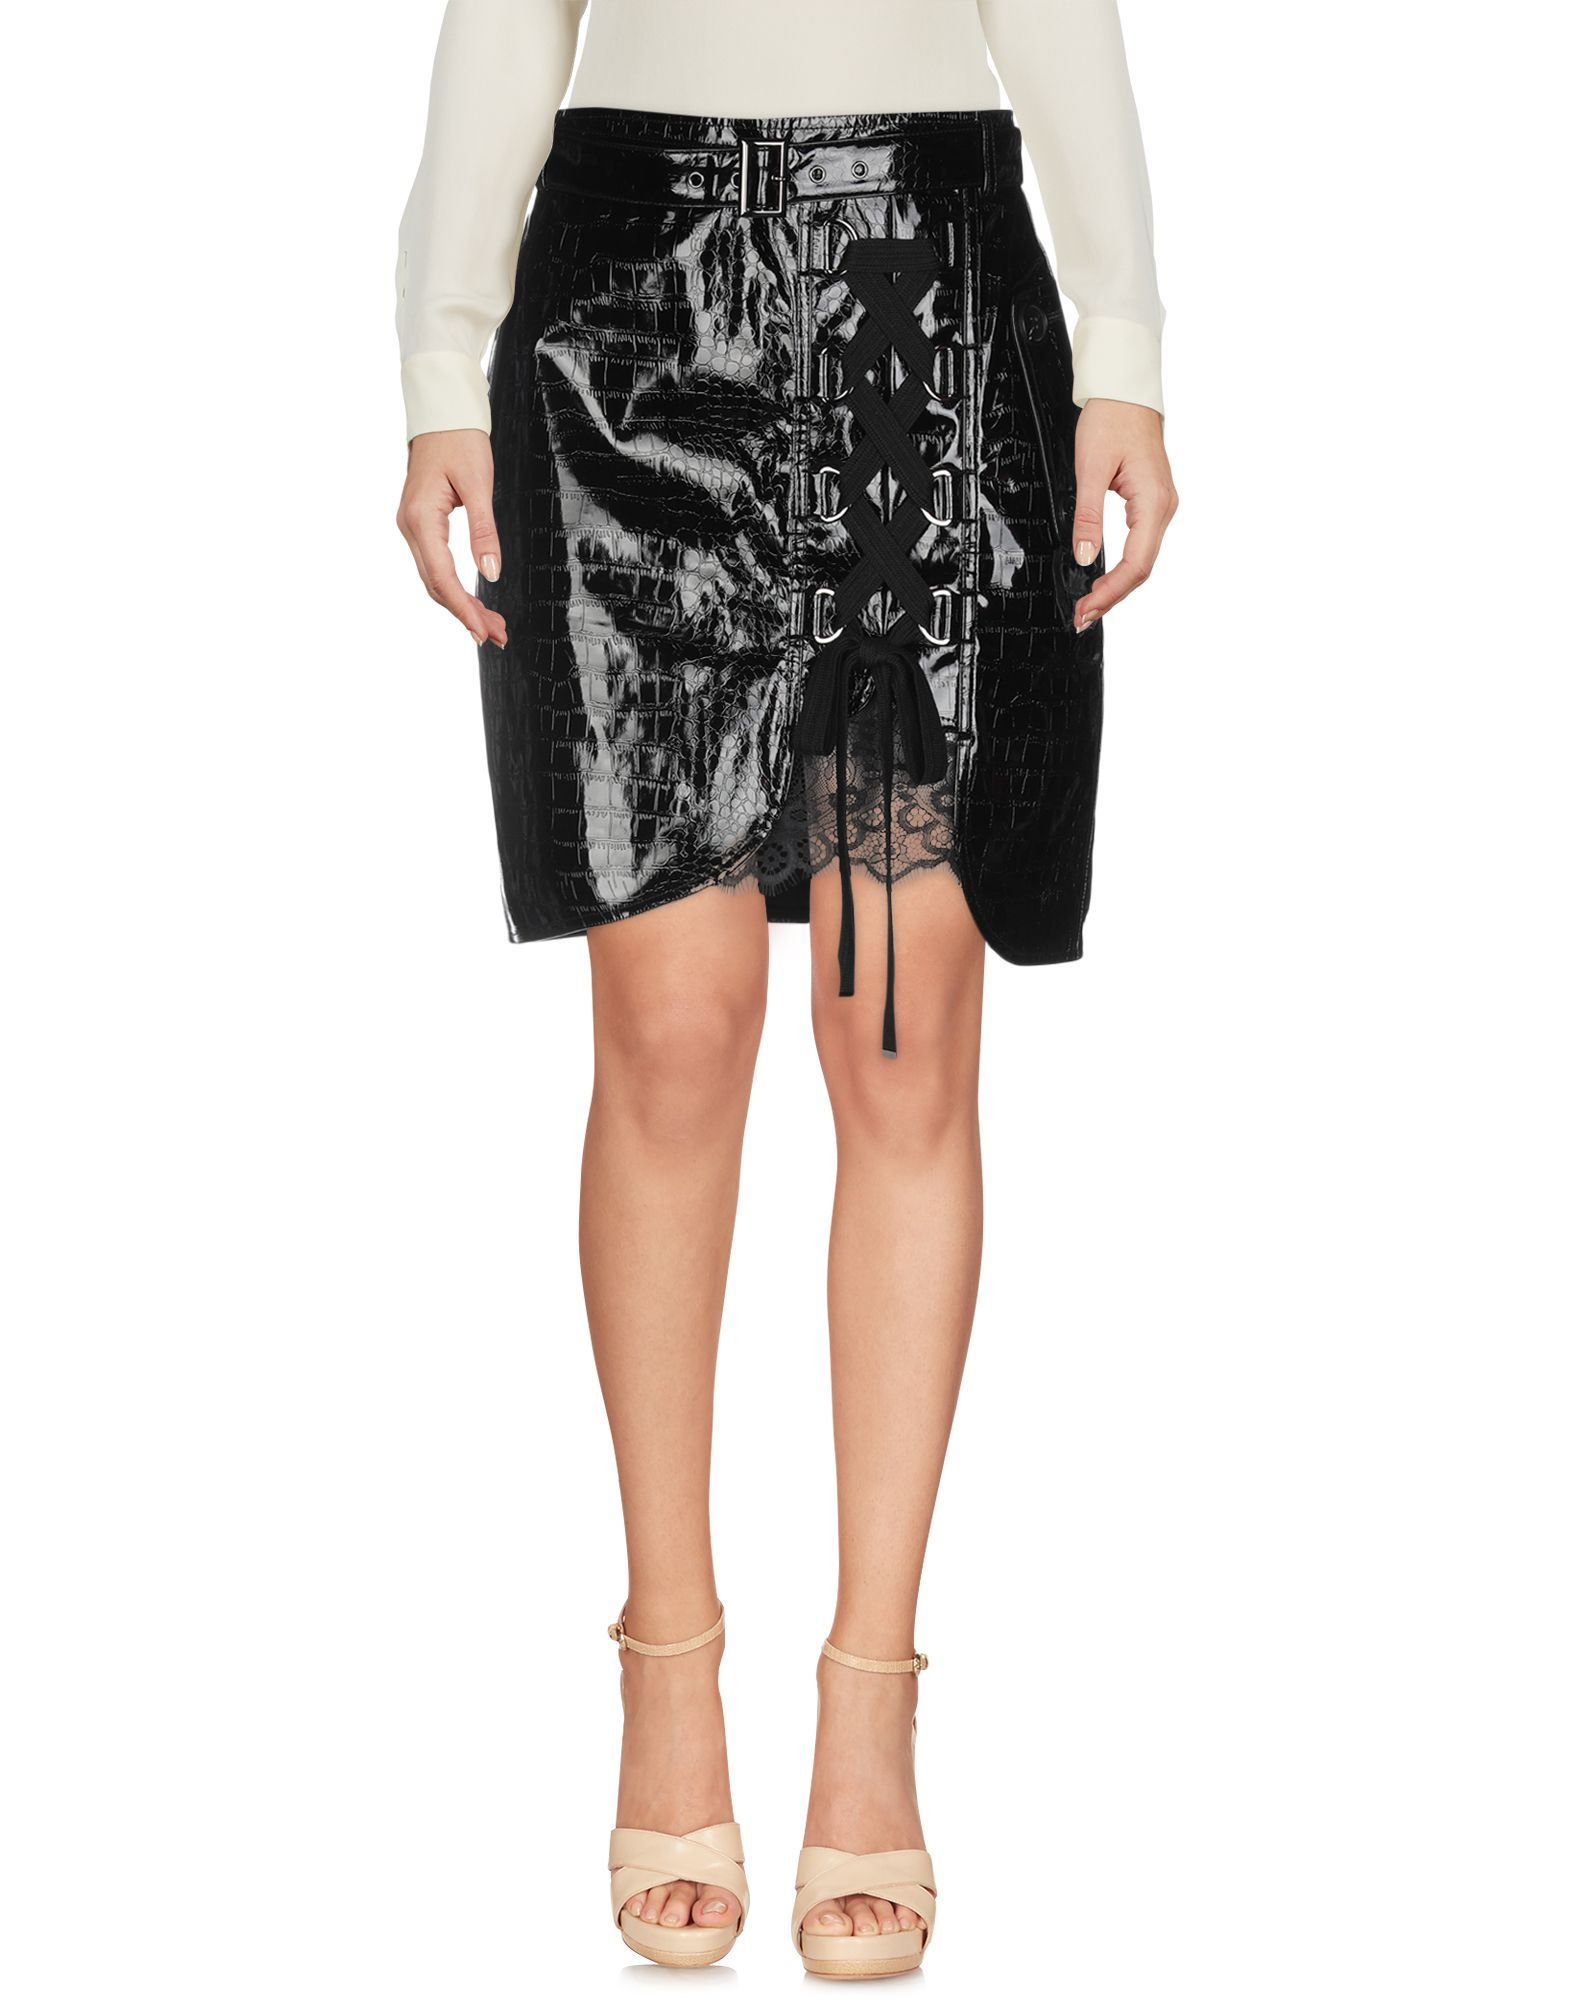 Self-Portrait Black Faux Leather Mini Skirt